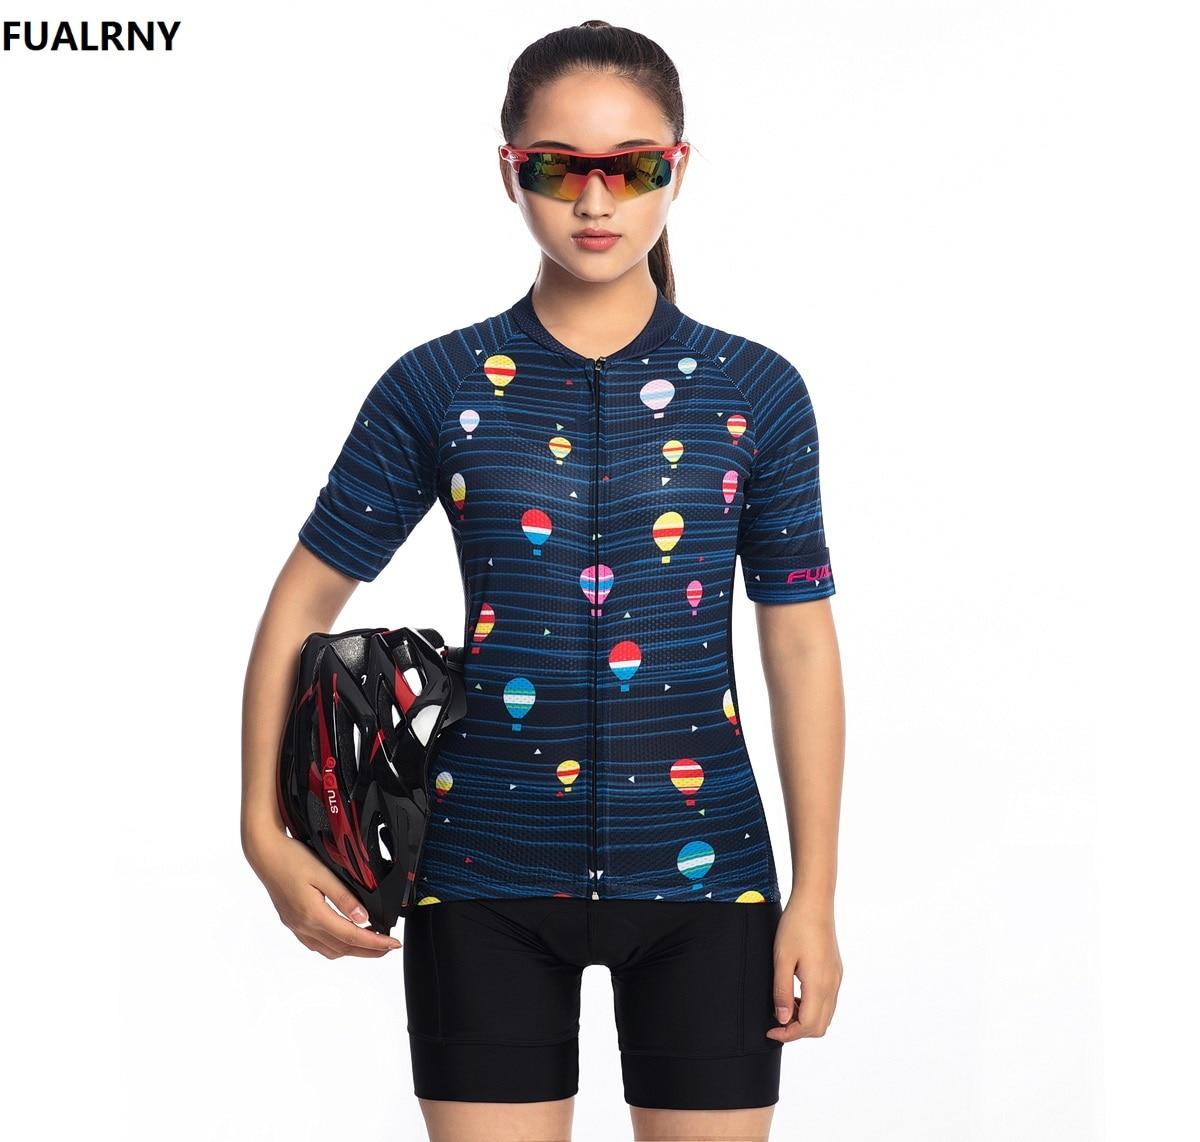 2018 FUALRNY Cycling Jersey Sets Summer Women MTB Bike Cycling Clothing Mountian Bicycle Clothes Ropa Ciclismo Cartoon balloon